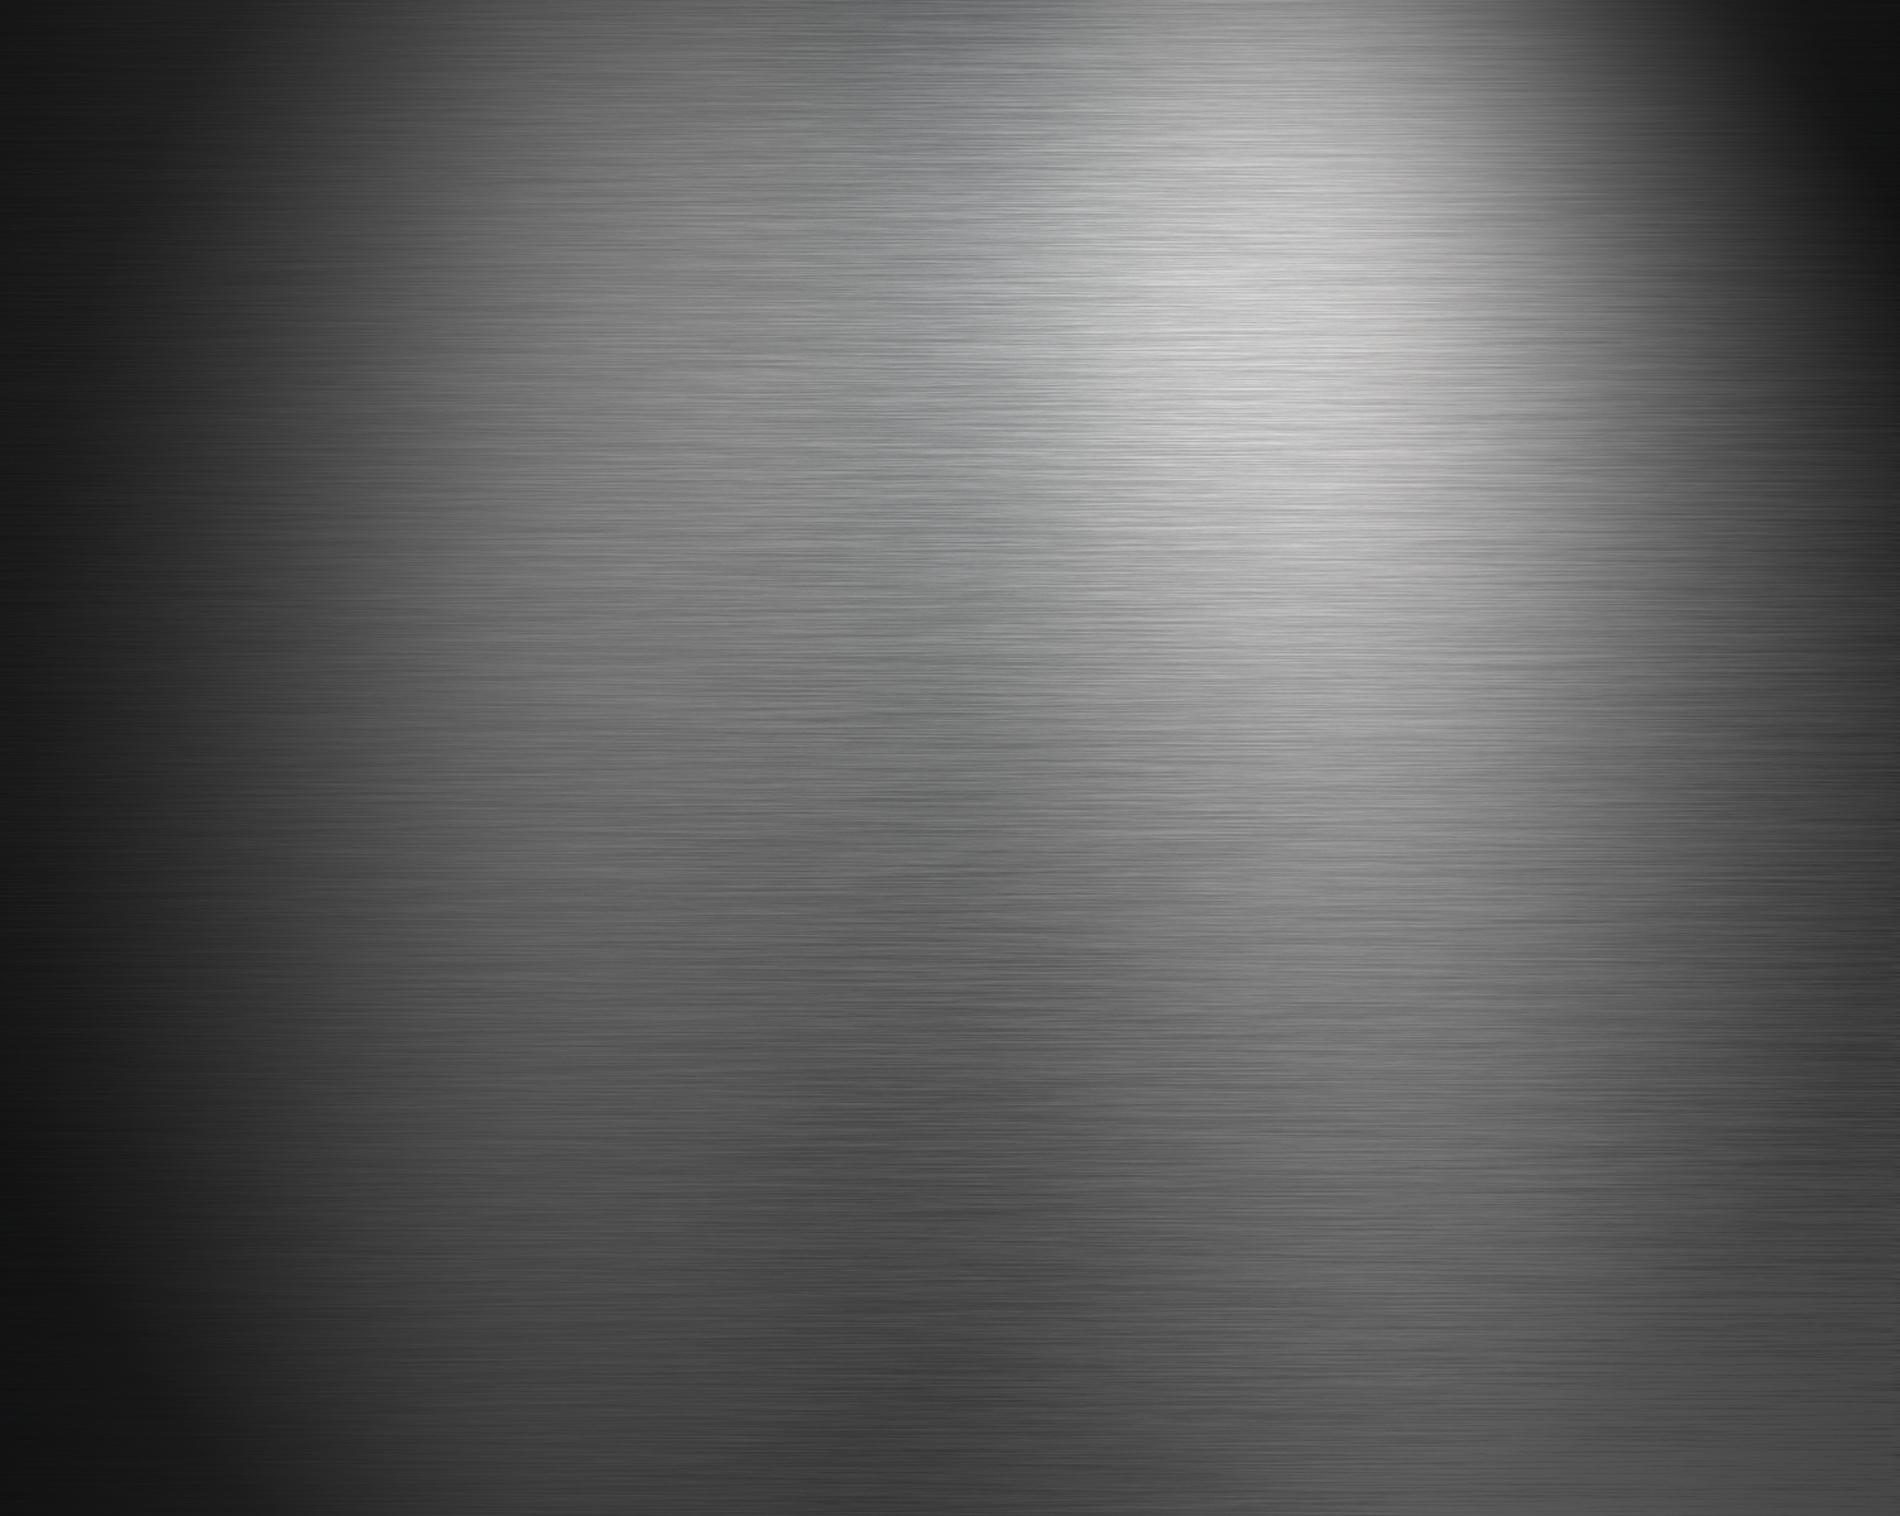 inox zellikleri. Black Bedroom Furniture Sets. Home Design Ideas